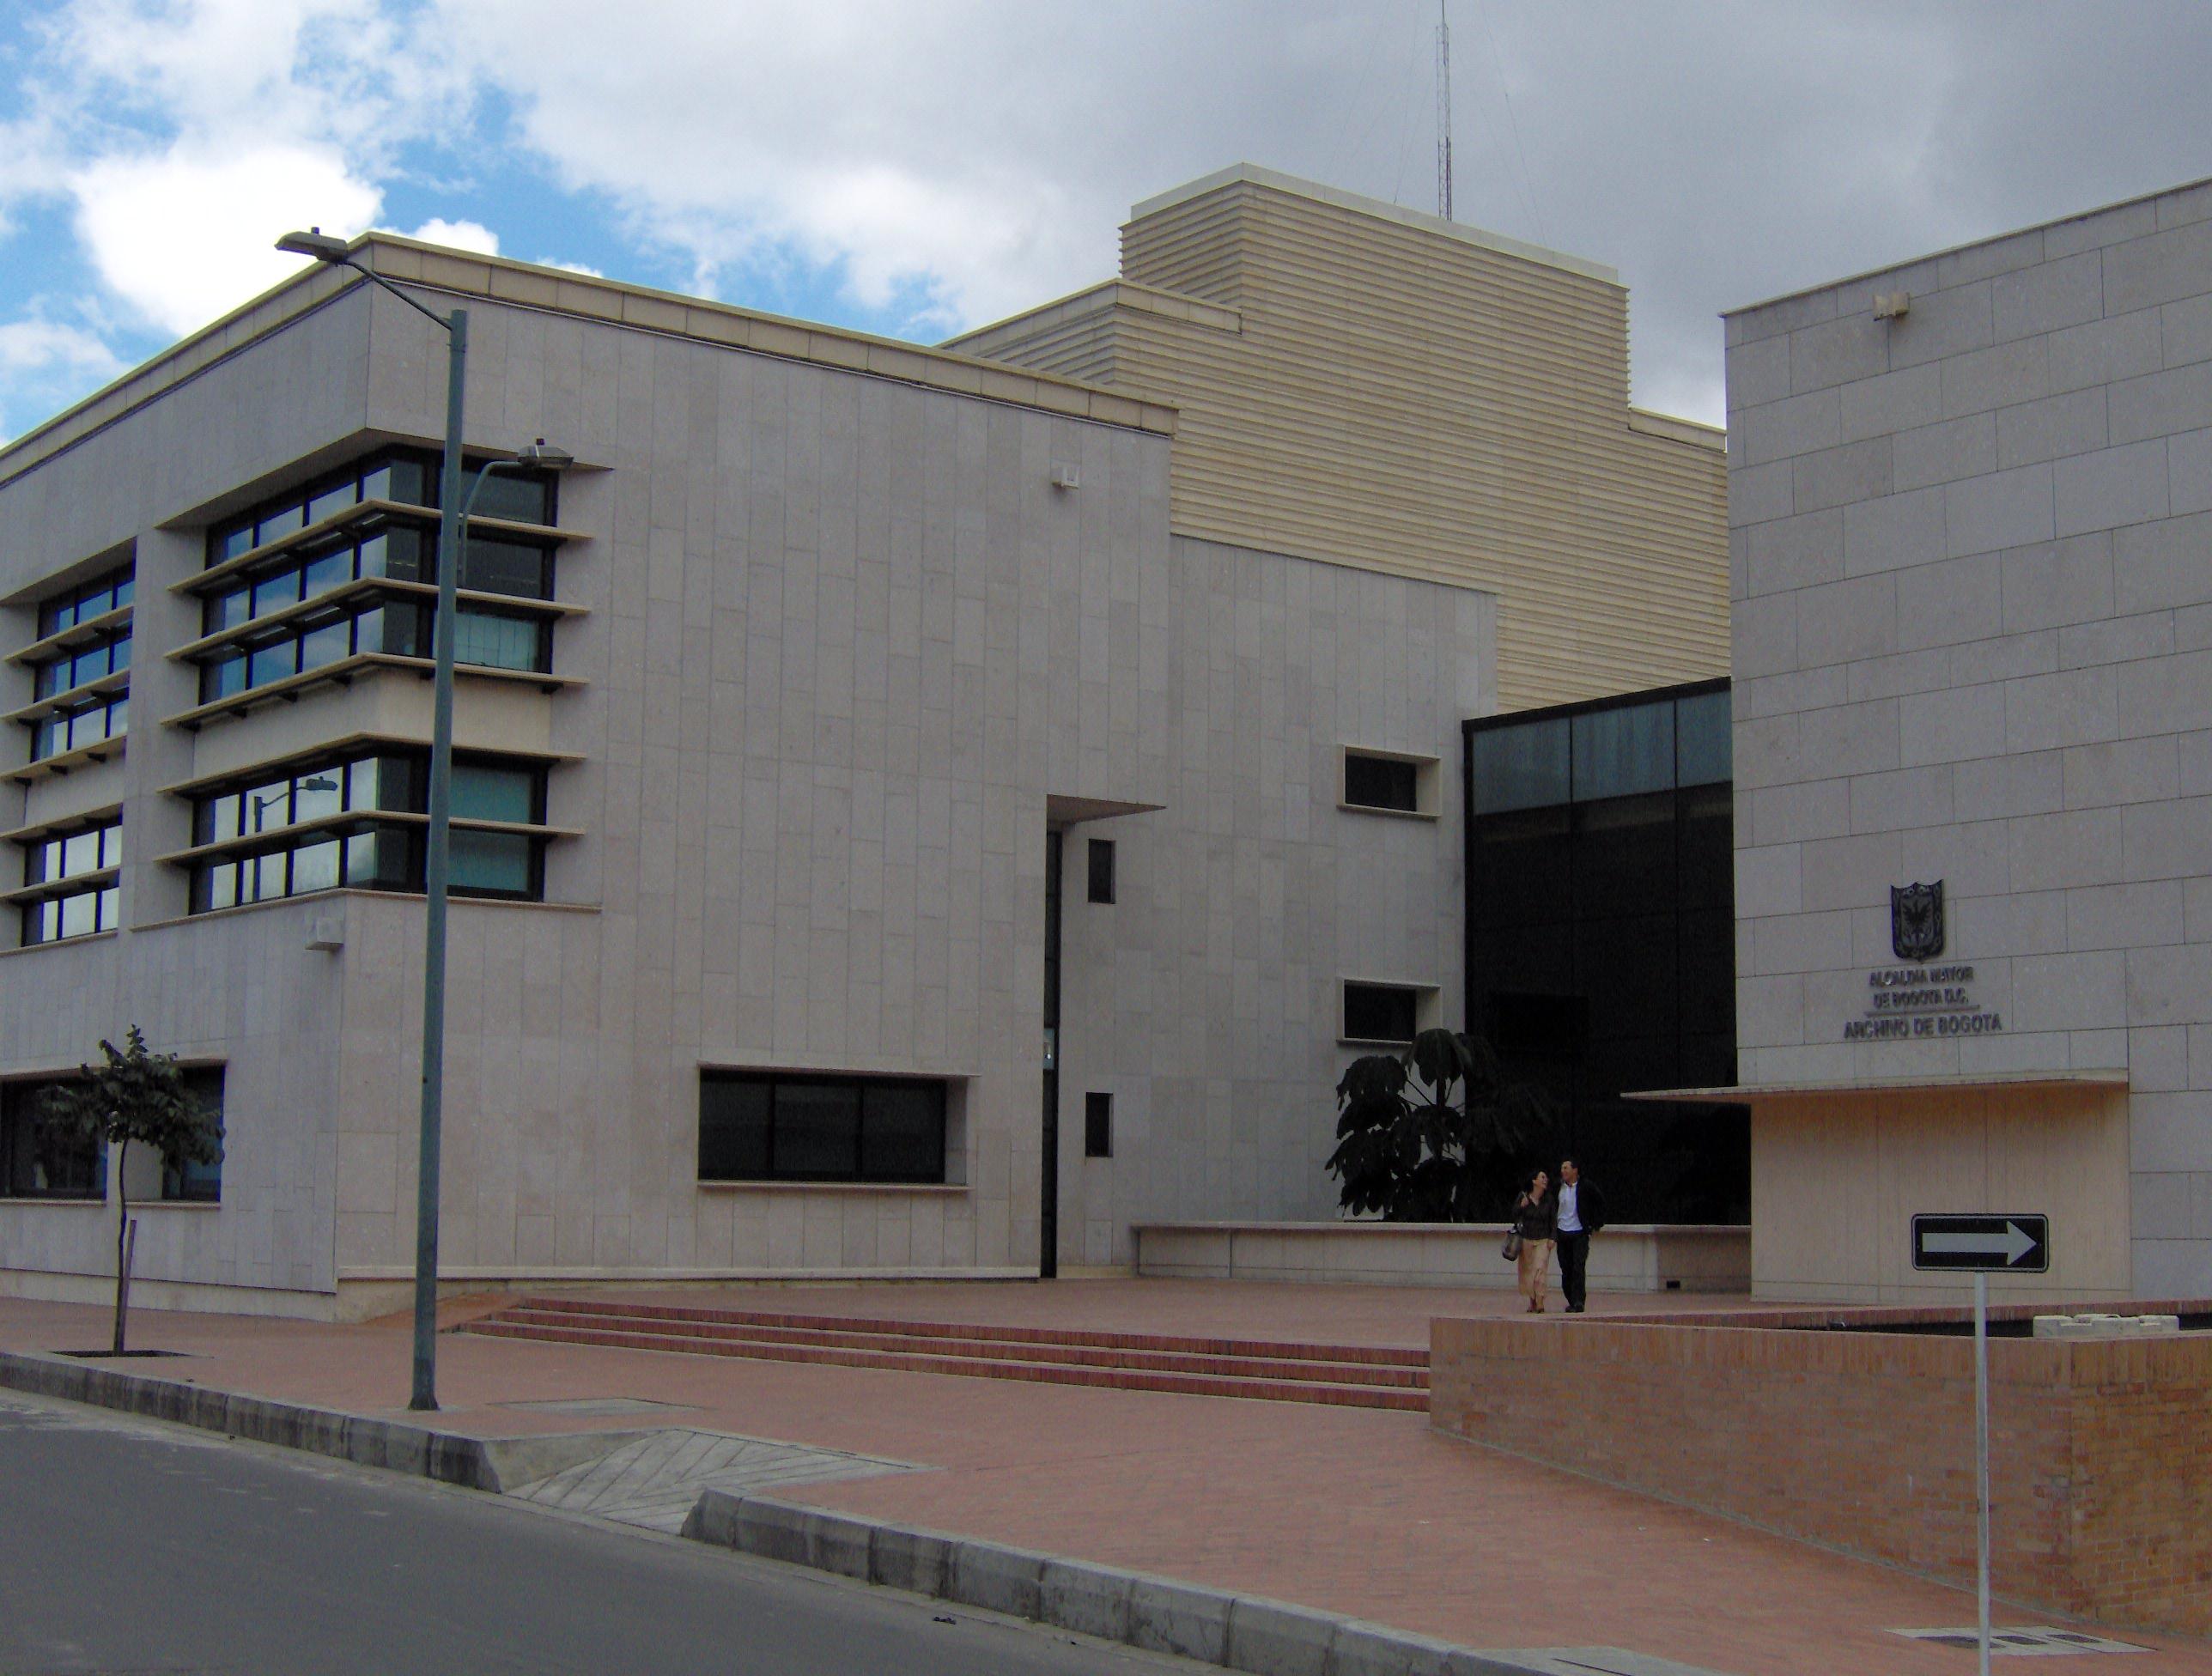 Pabón, C. (2006). Archivo Distrital de Bogotá. Recuperado de https://commons.wikimedia.org/wiki/File:Archivo_de_Bogot%C3%A1_D.C..jpg